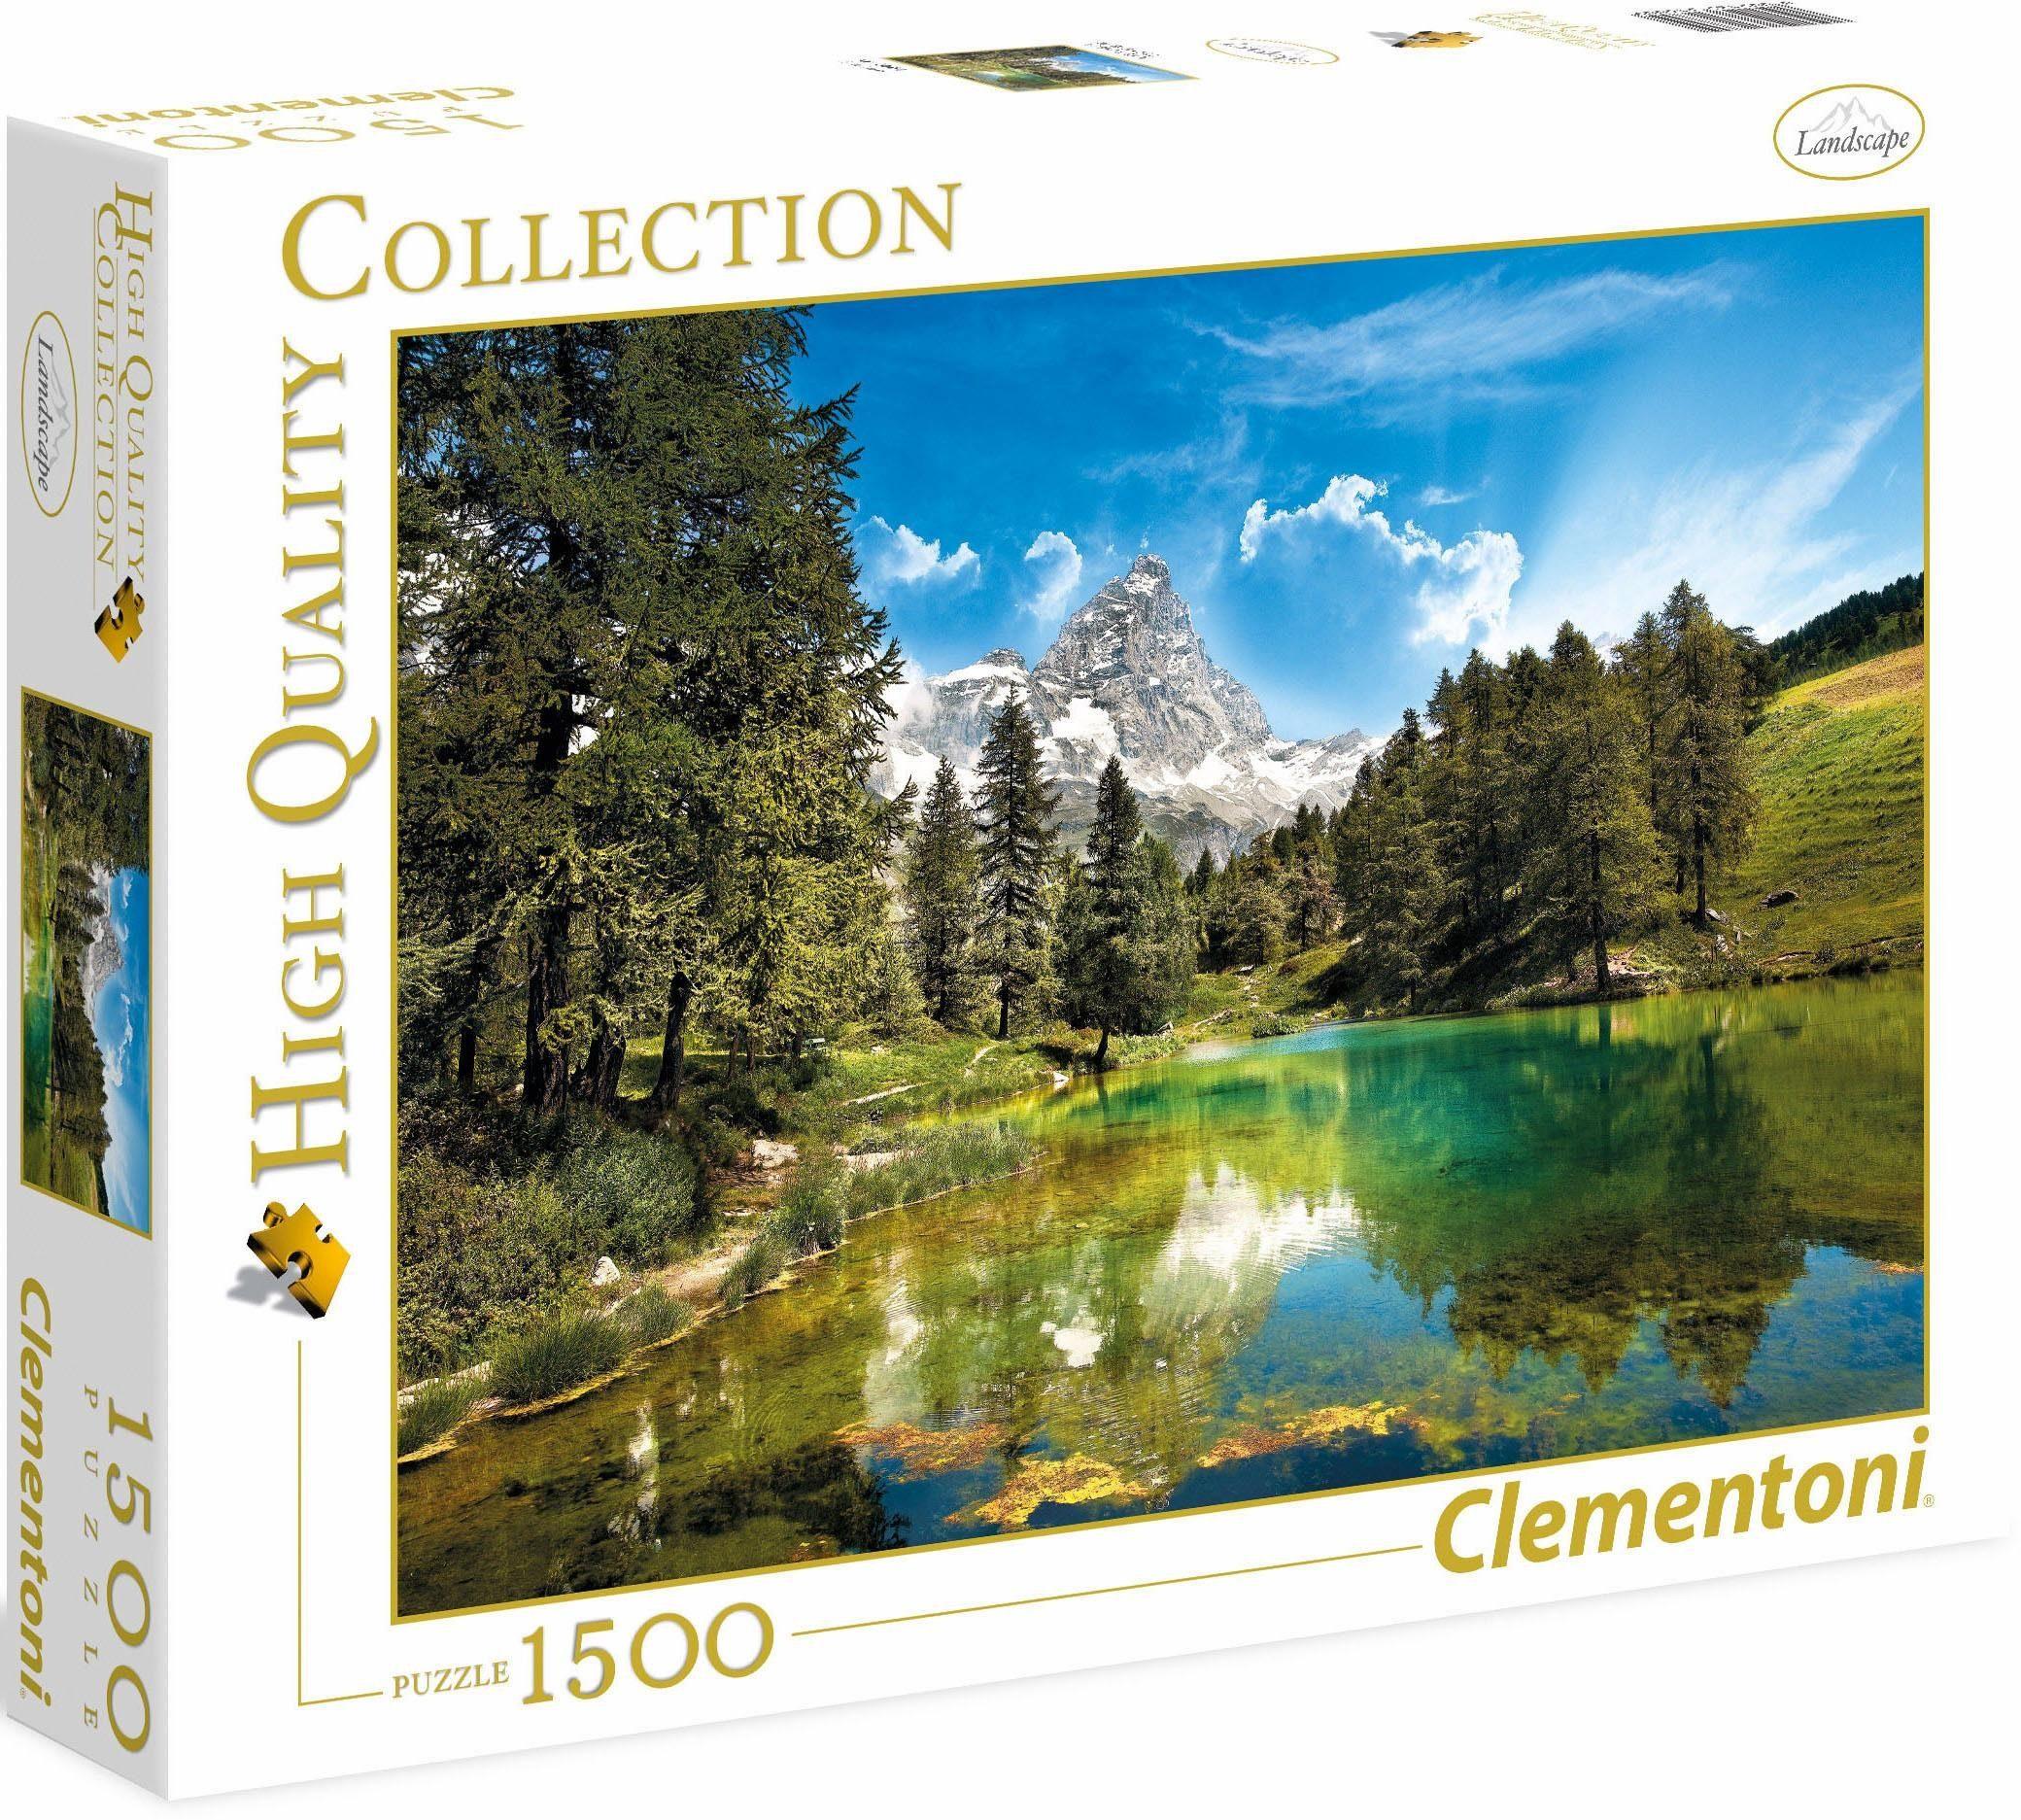 Clementoni Puzzle, 1500 Teile, »Der blaue See«